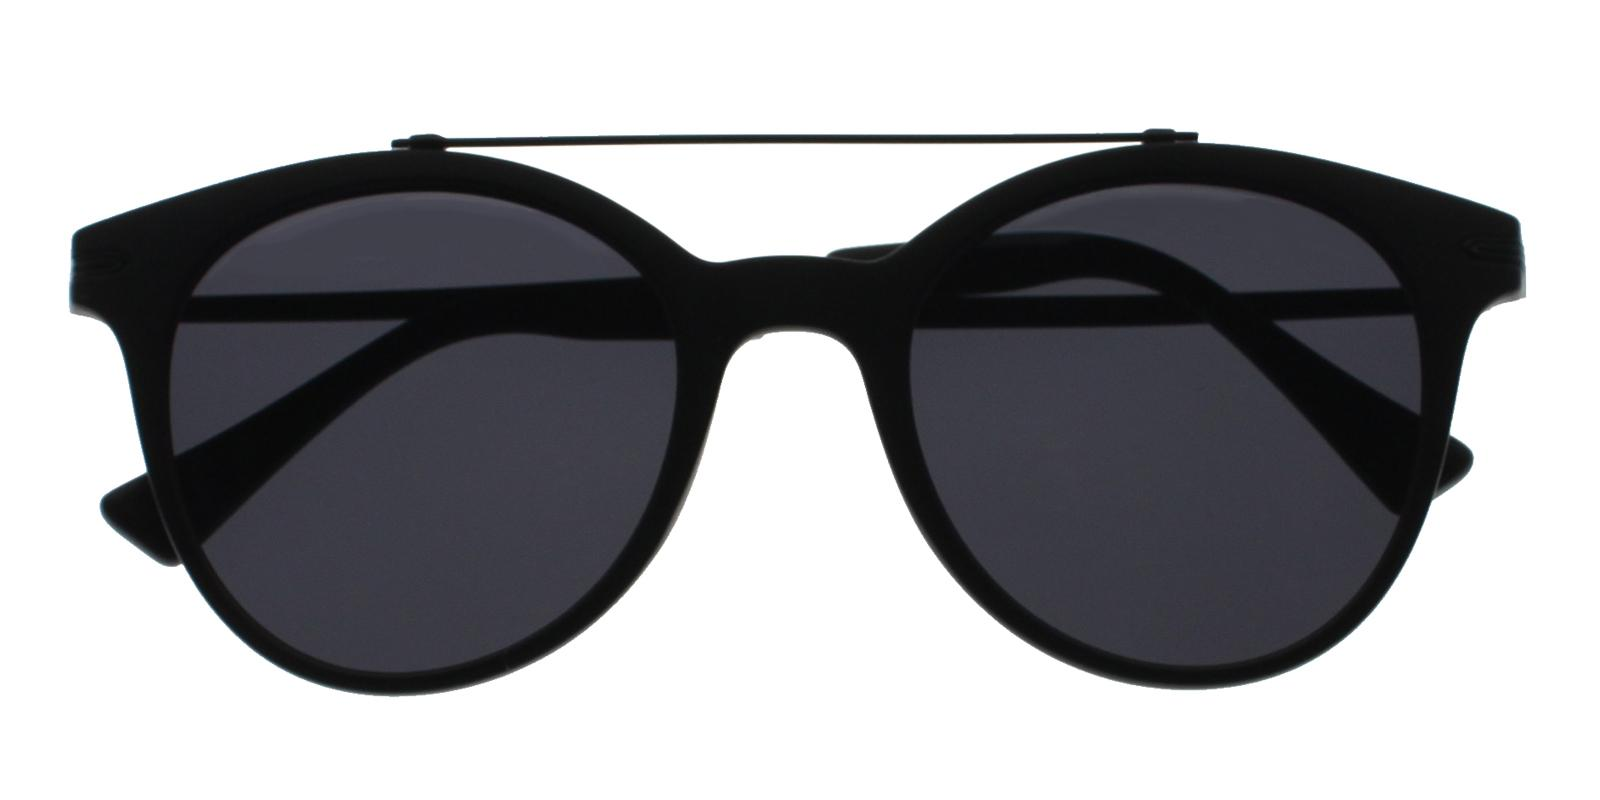 Aria Black Metal , Combination , TR UniversalBridgeFit , Sunglasses Frames from ABBE Glasses